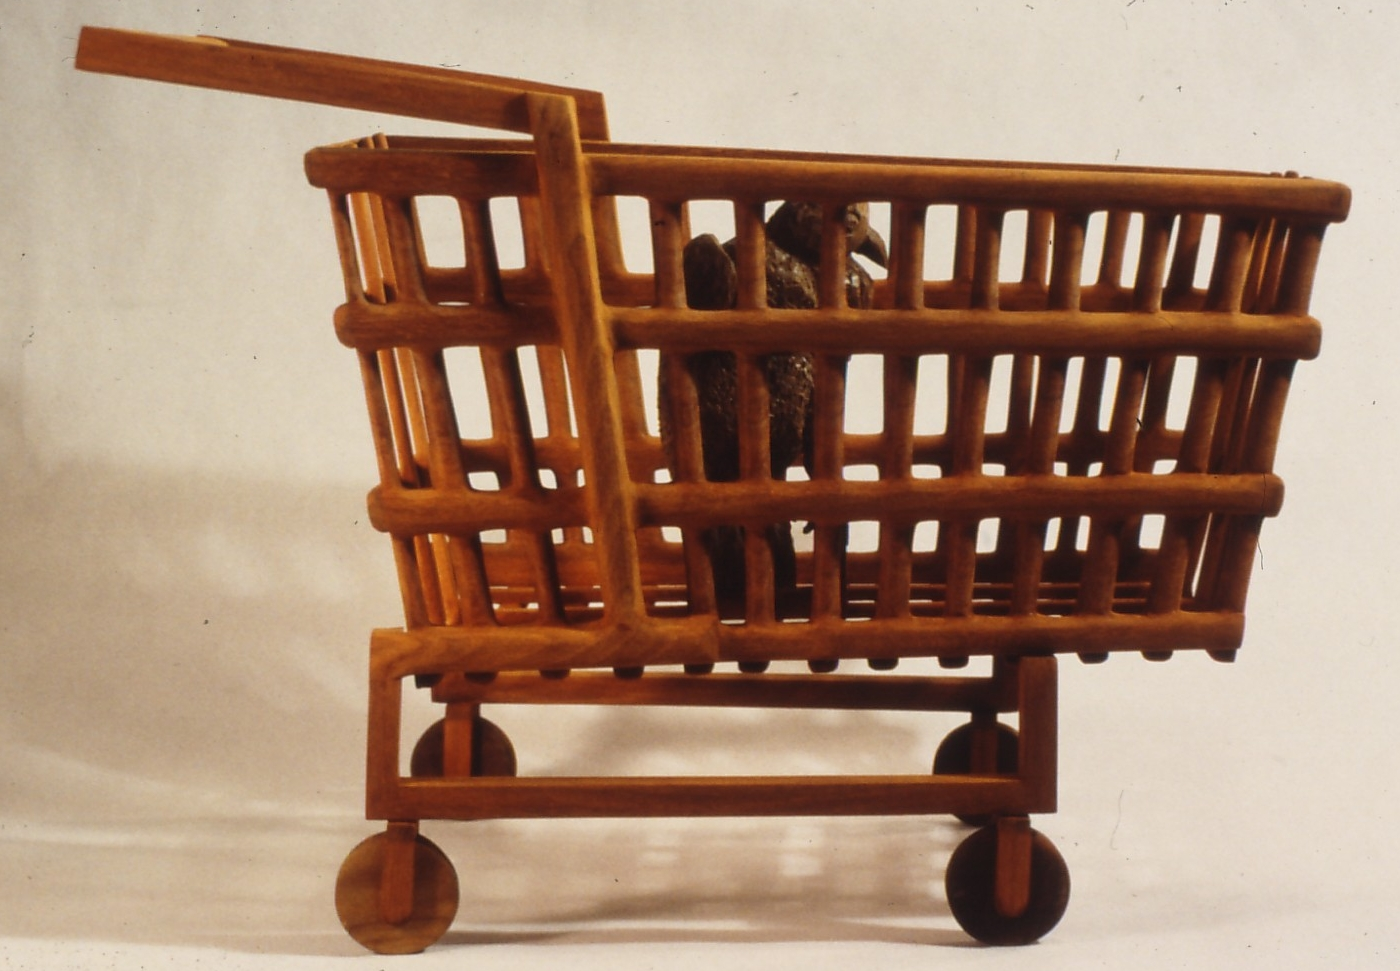 9.Audubon Shopping cart.jpg